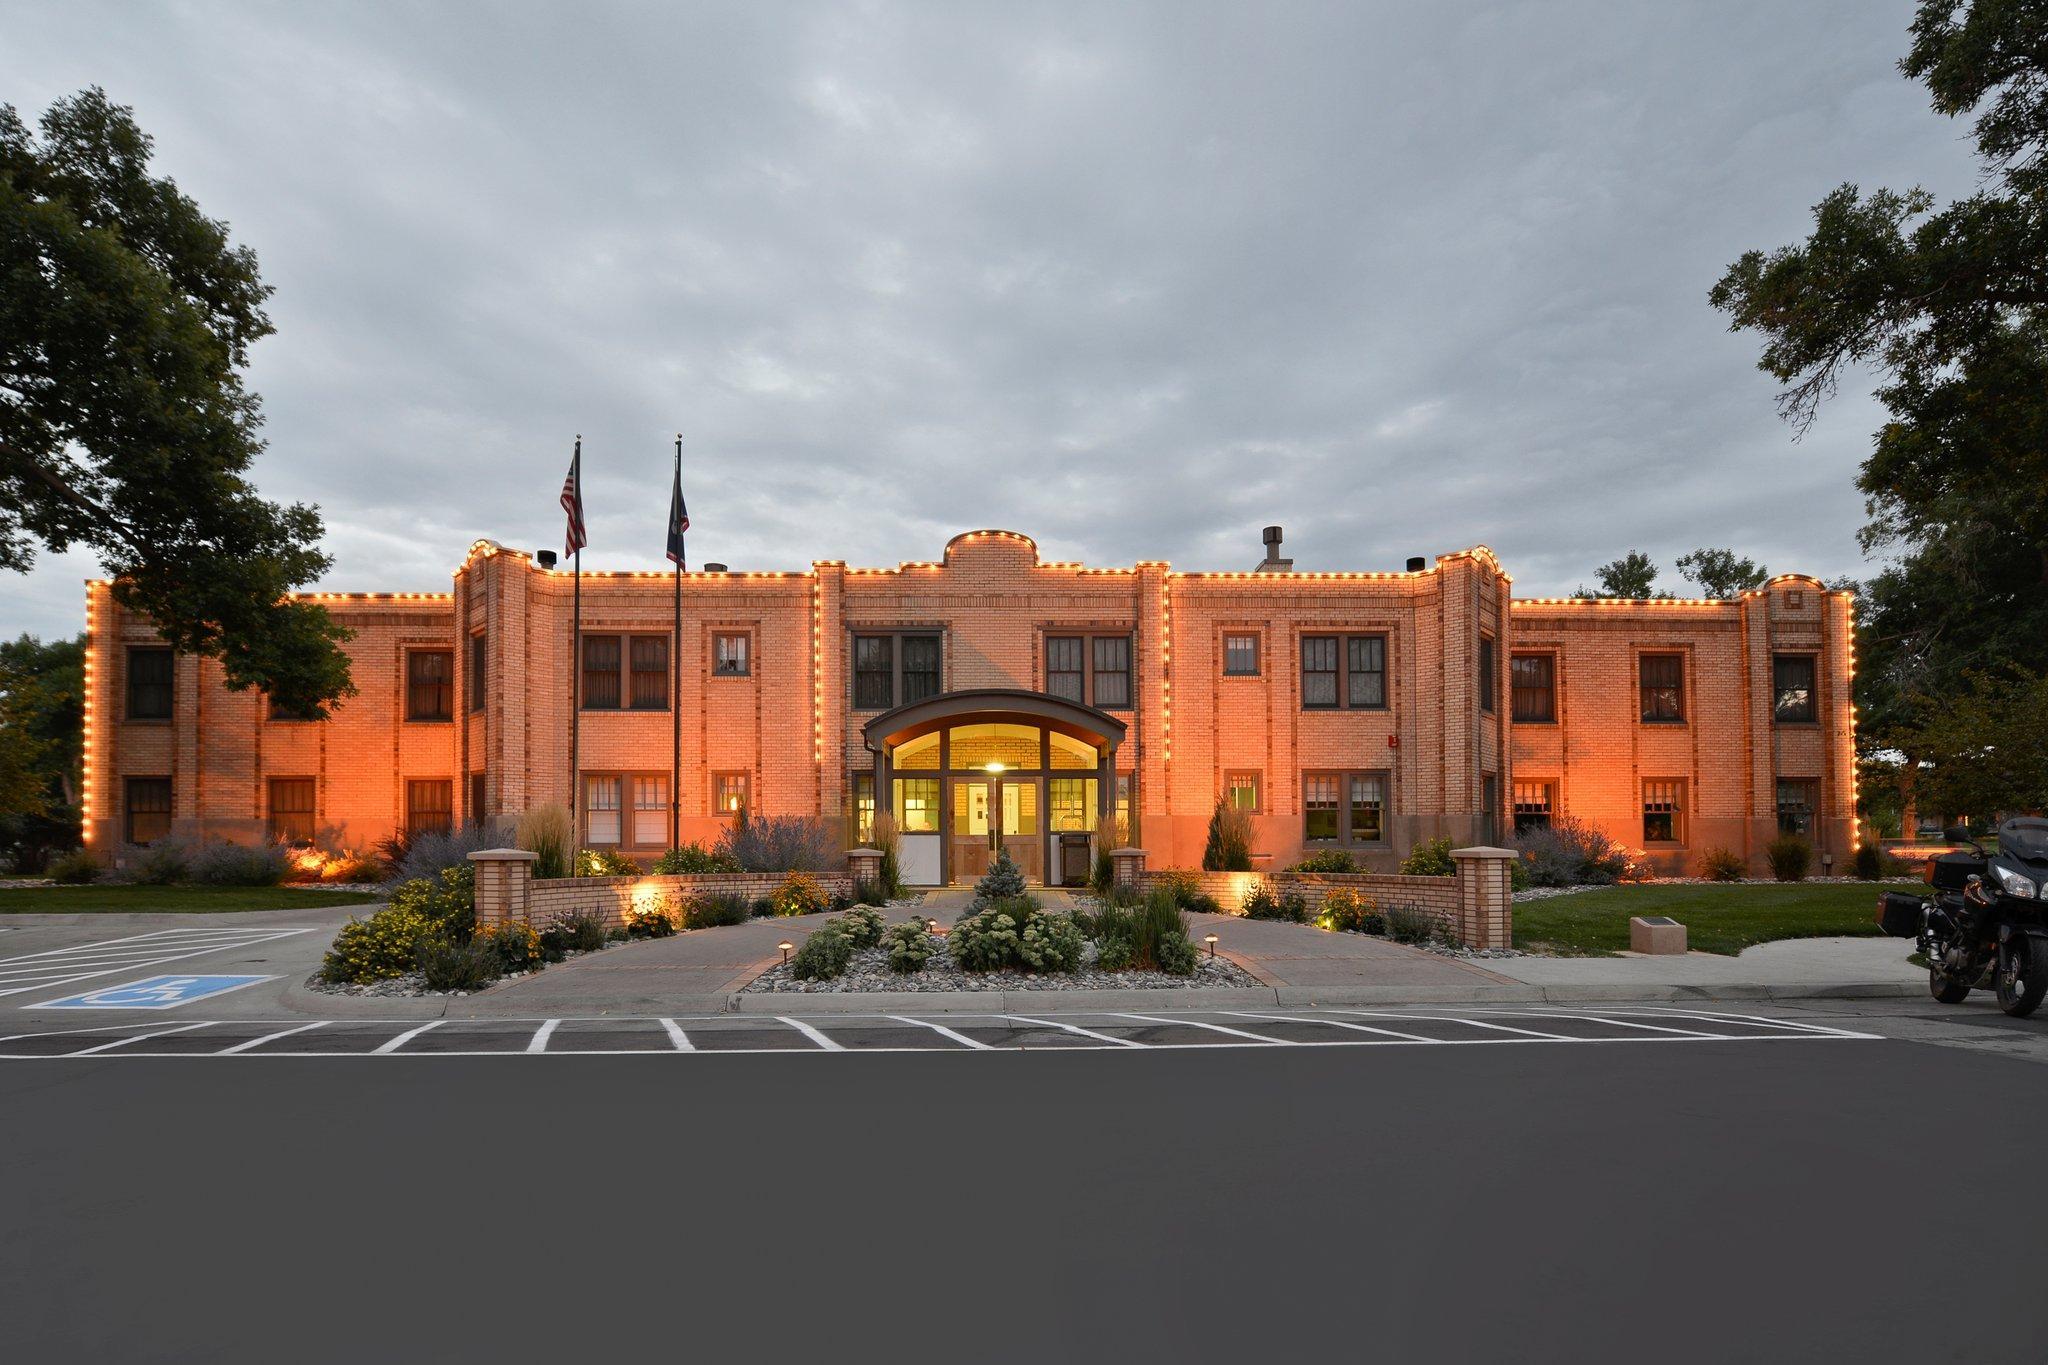 BEST WESTERN PLUS Plaza Hotel